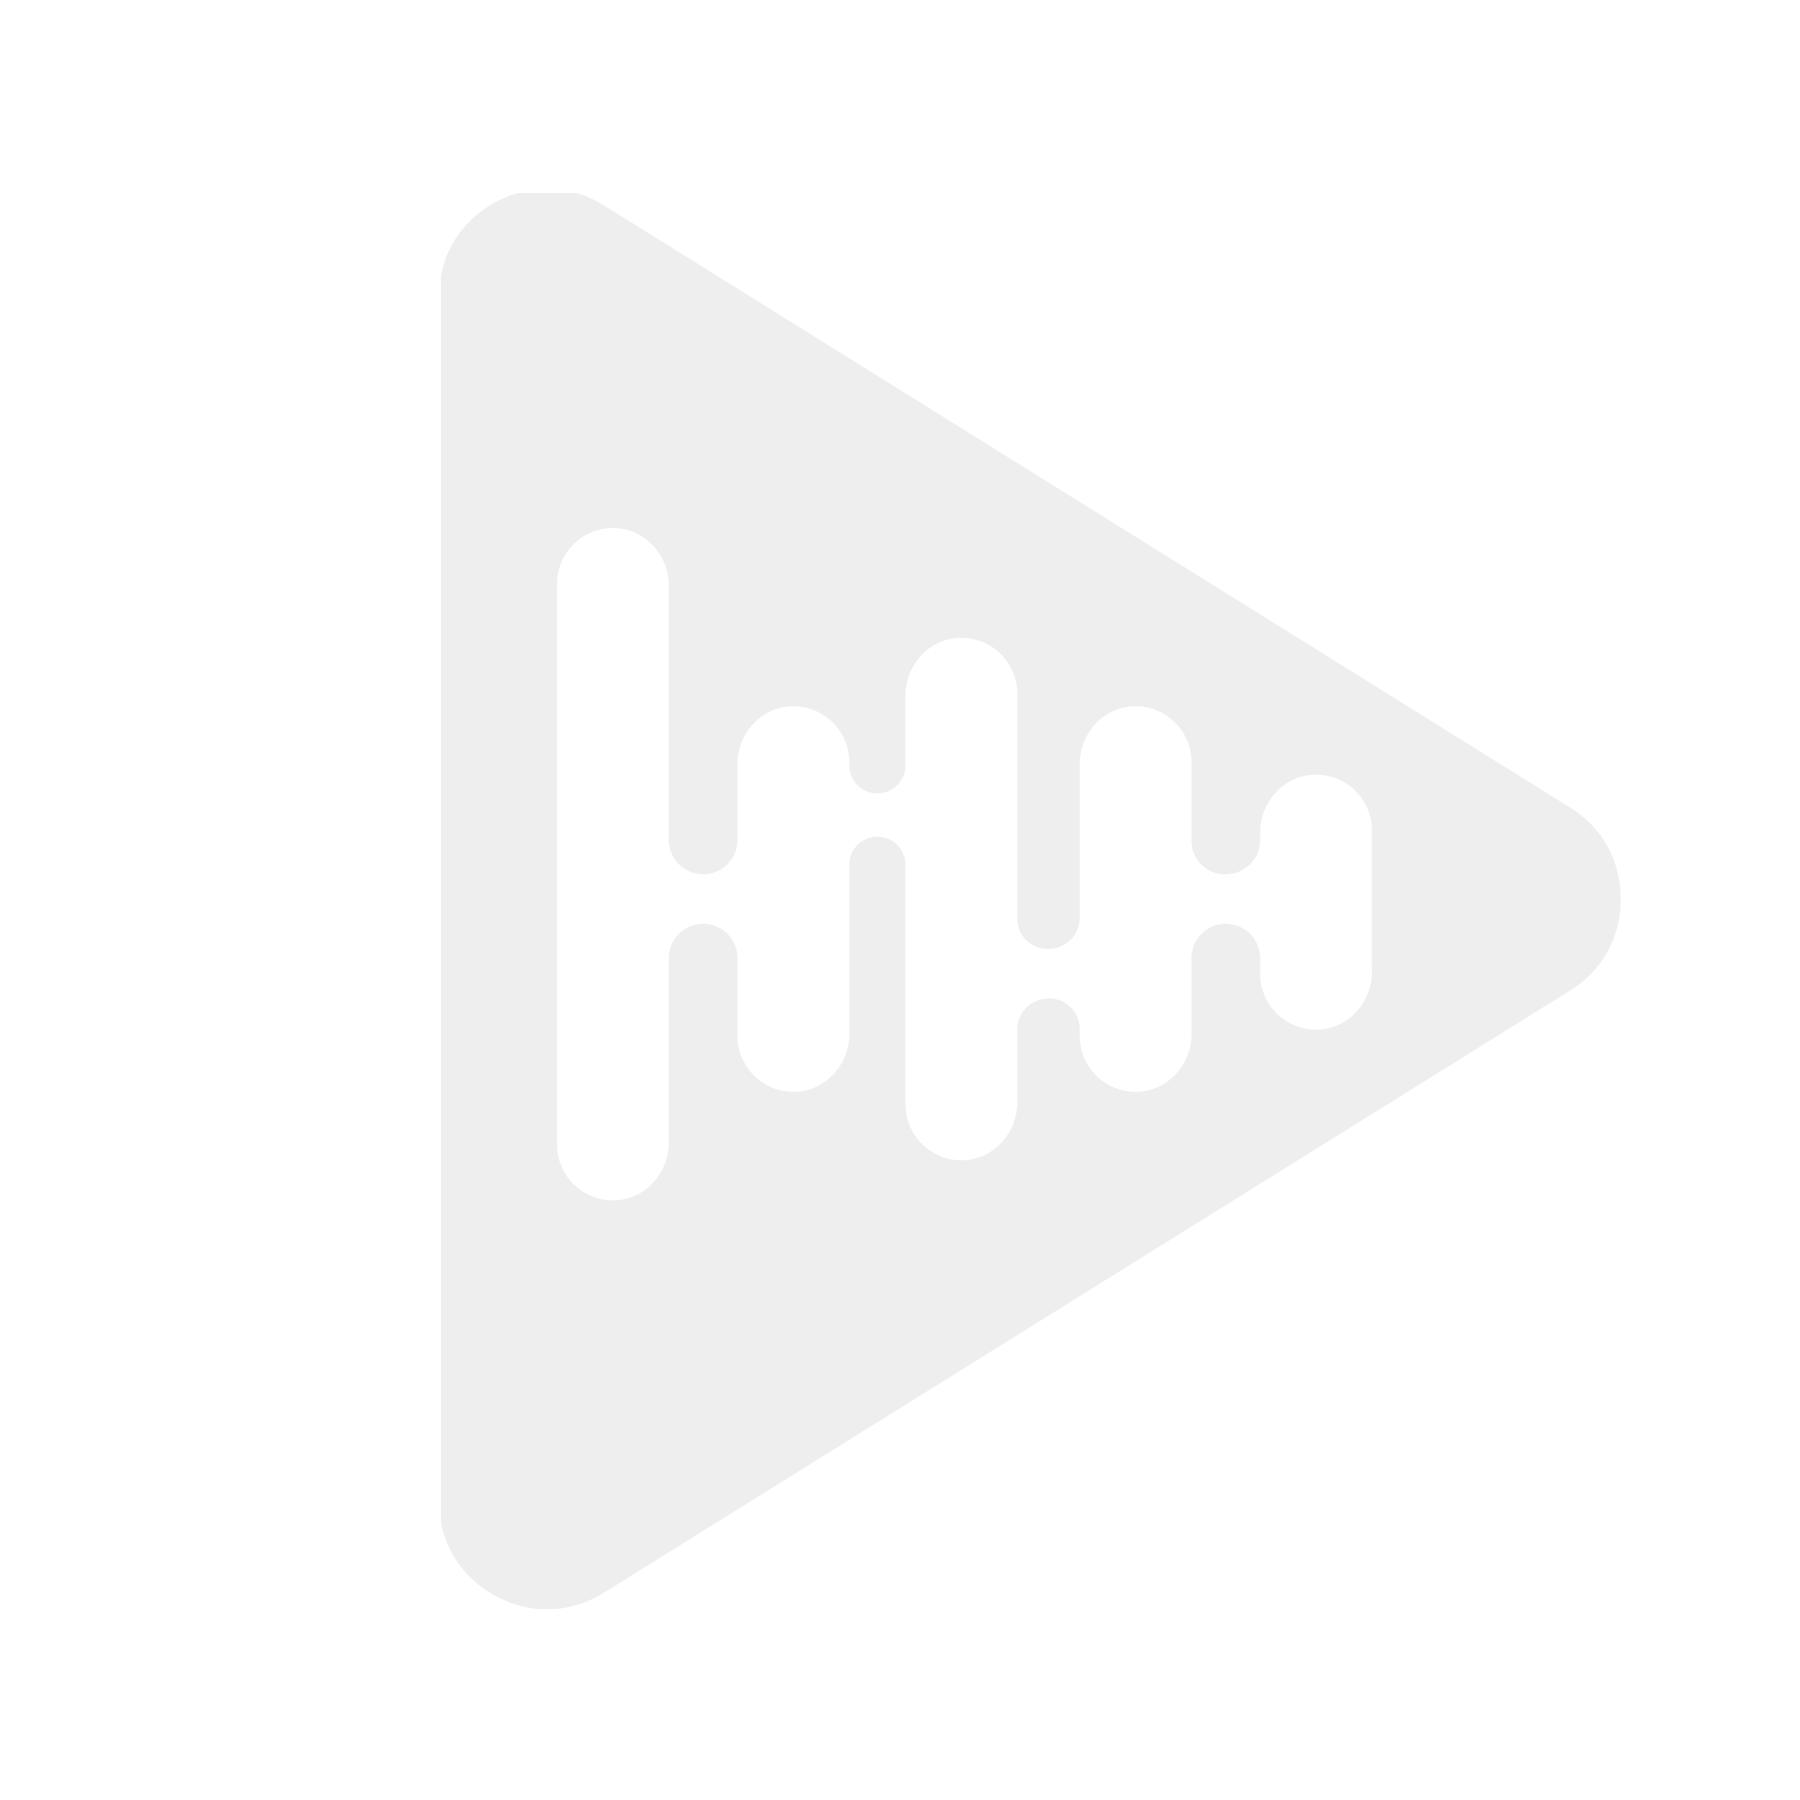 Skoddejuice Champagne Aroma